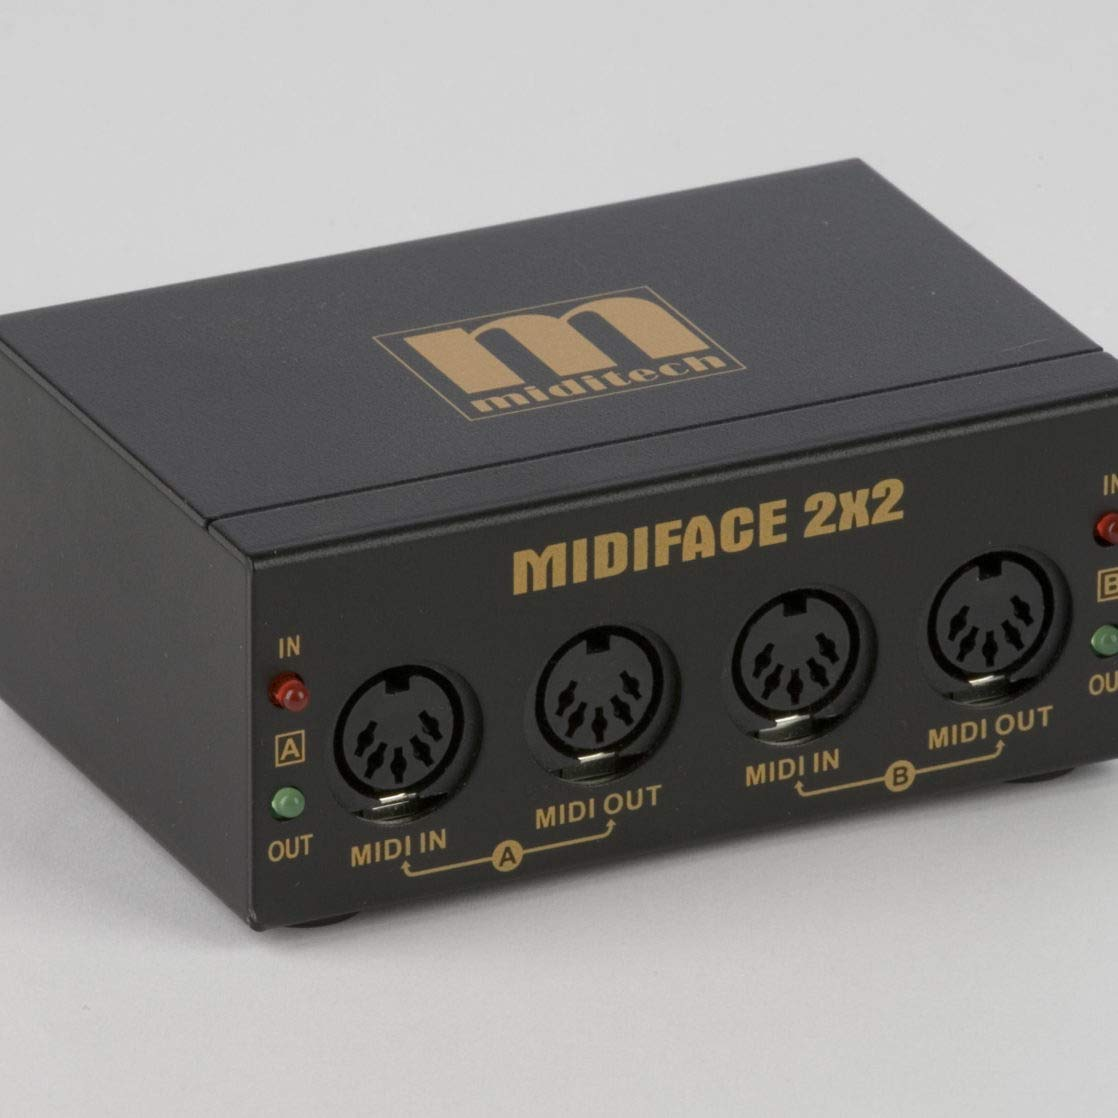 MIDITECH MIDIFACE 2X2 by MidiTech (Image #1)